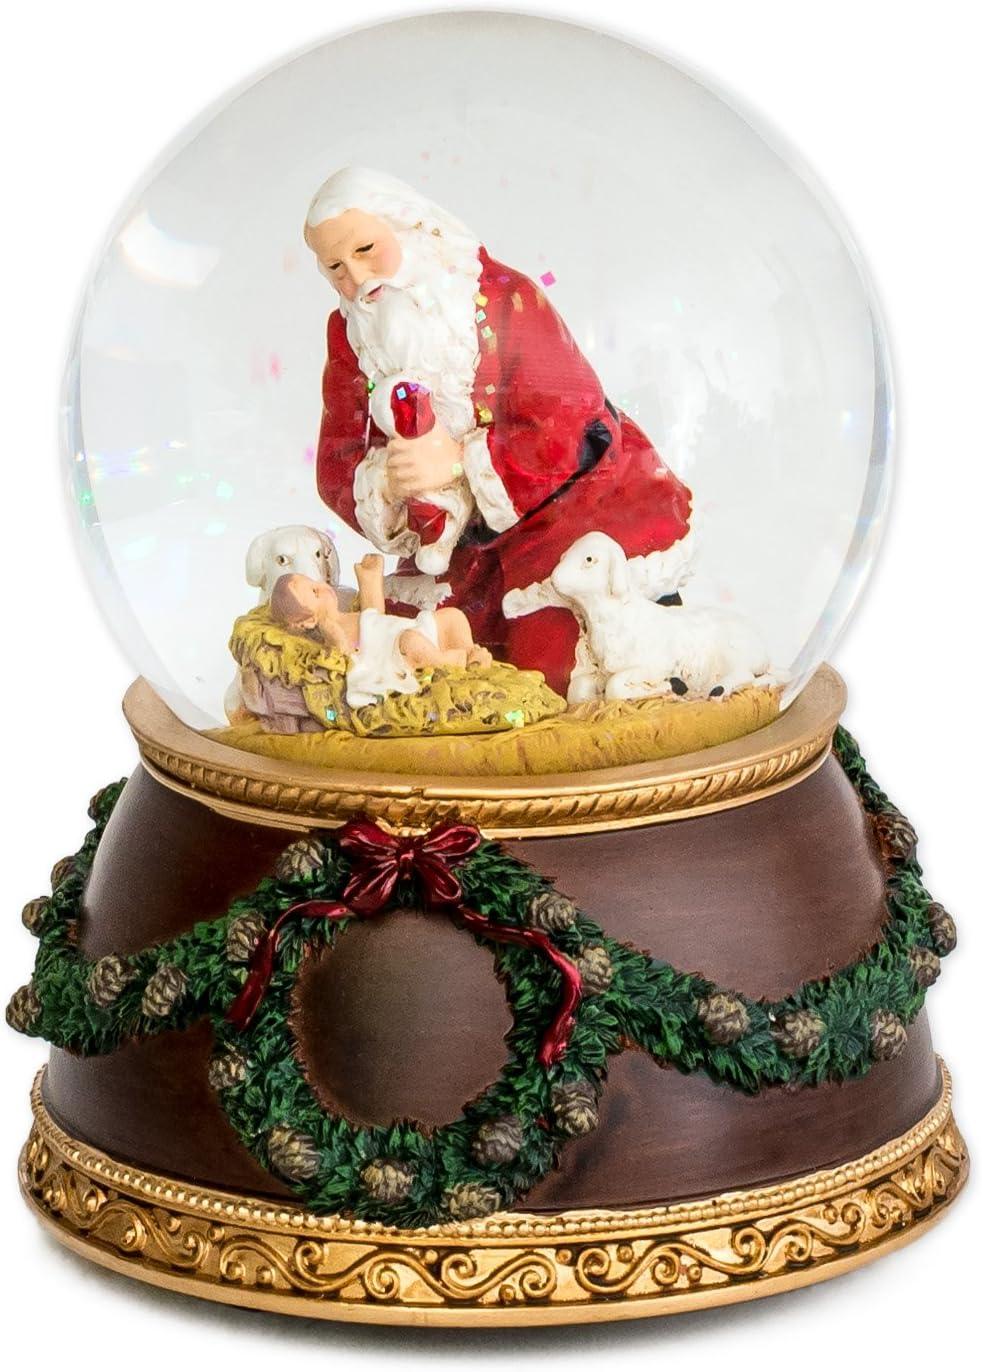 Kneeling Santa Baby Jesus 6 Inch Holiday Water Globe Plays Tune Silent Night